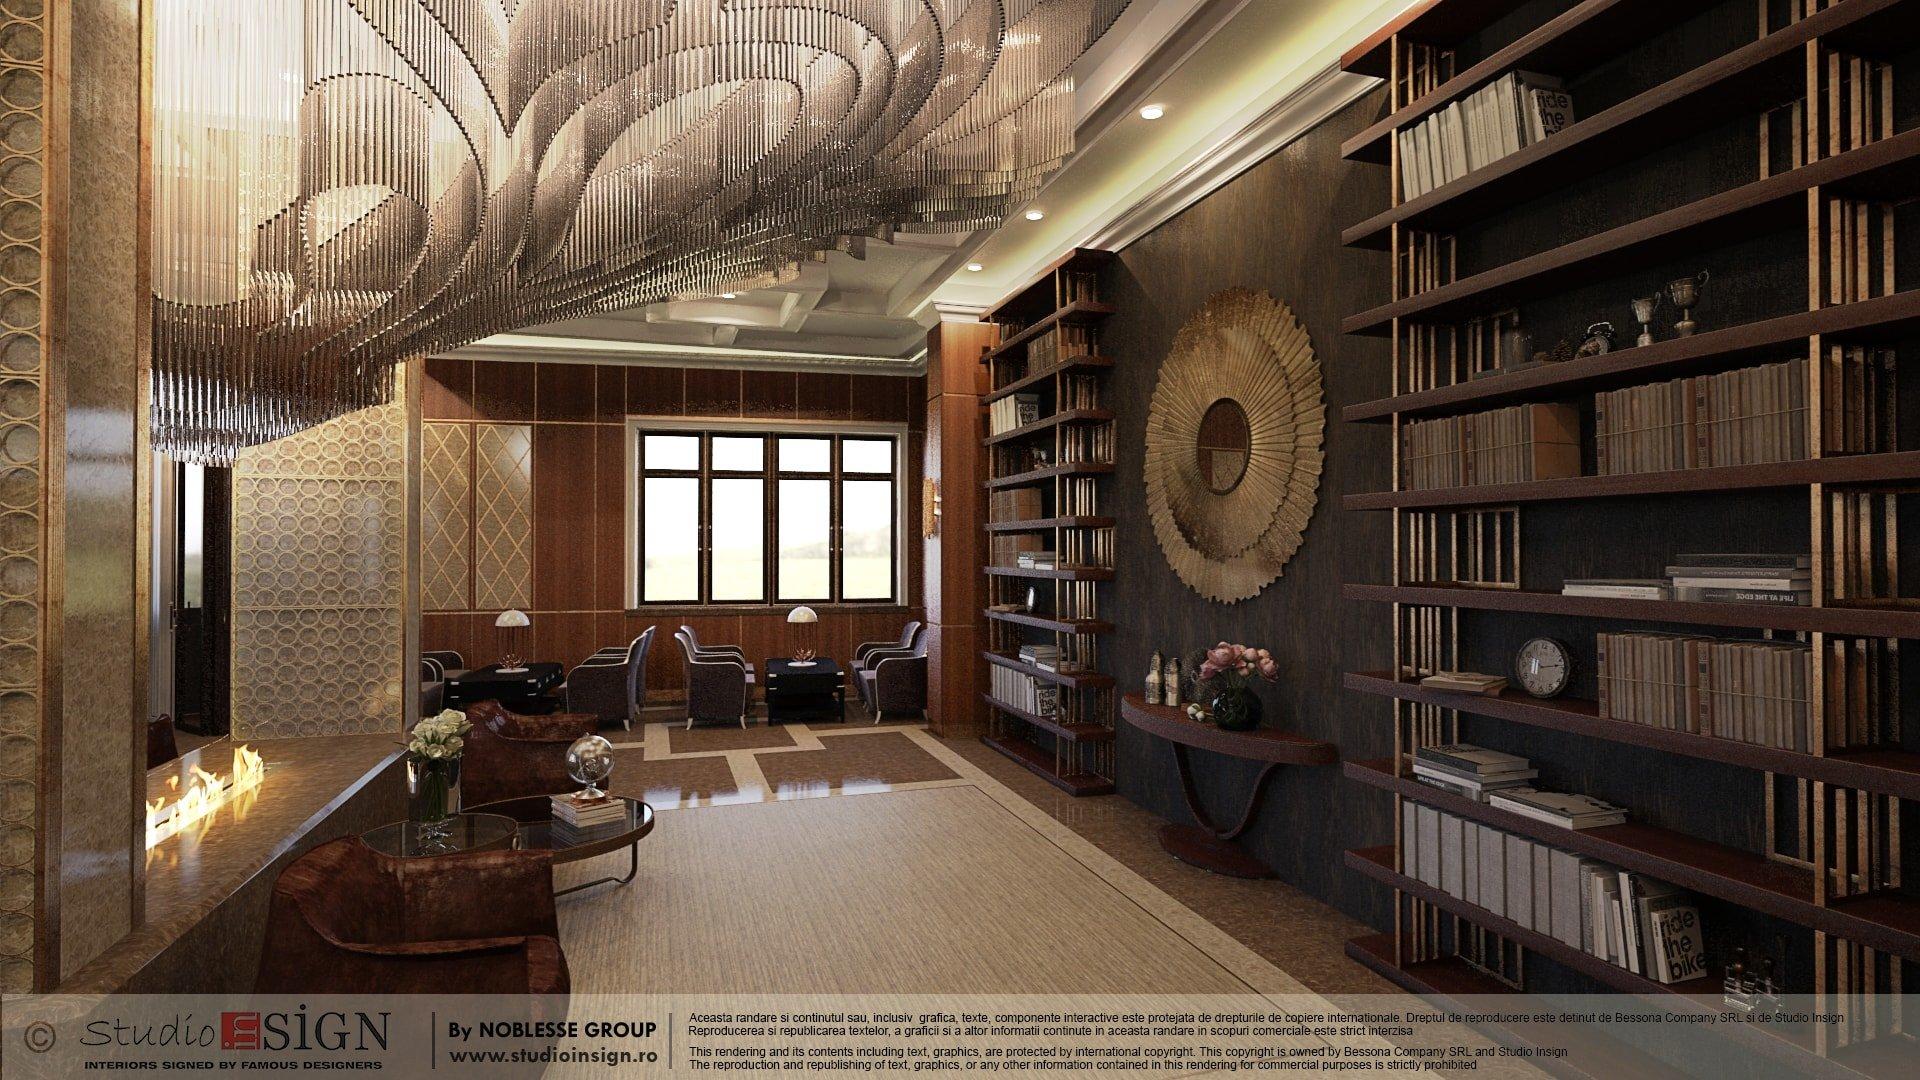 birouri bucuresti proiectare hotel stil clasic brasov studio insign